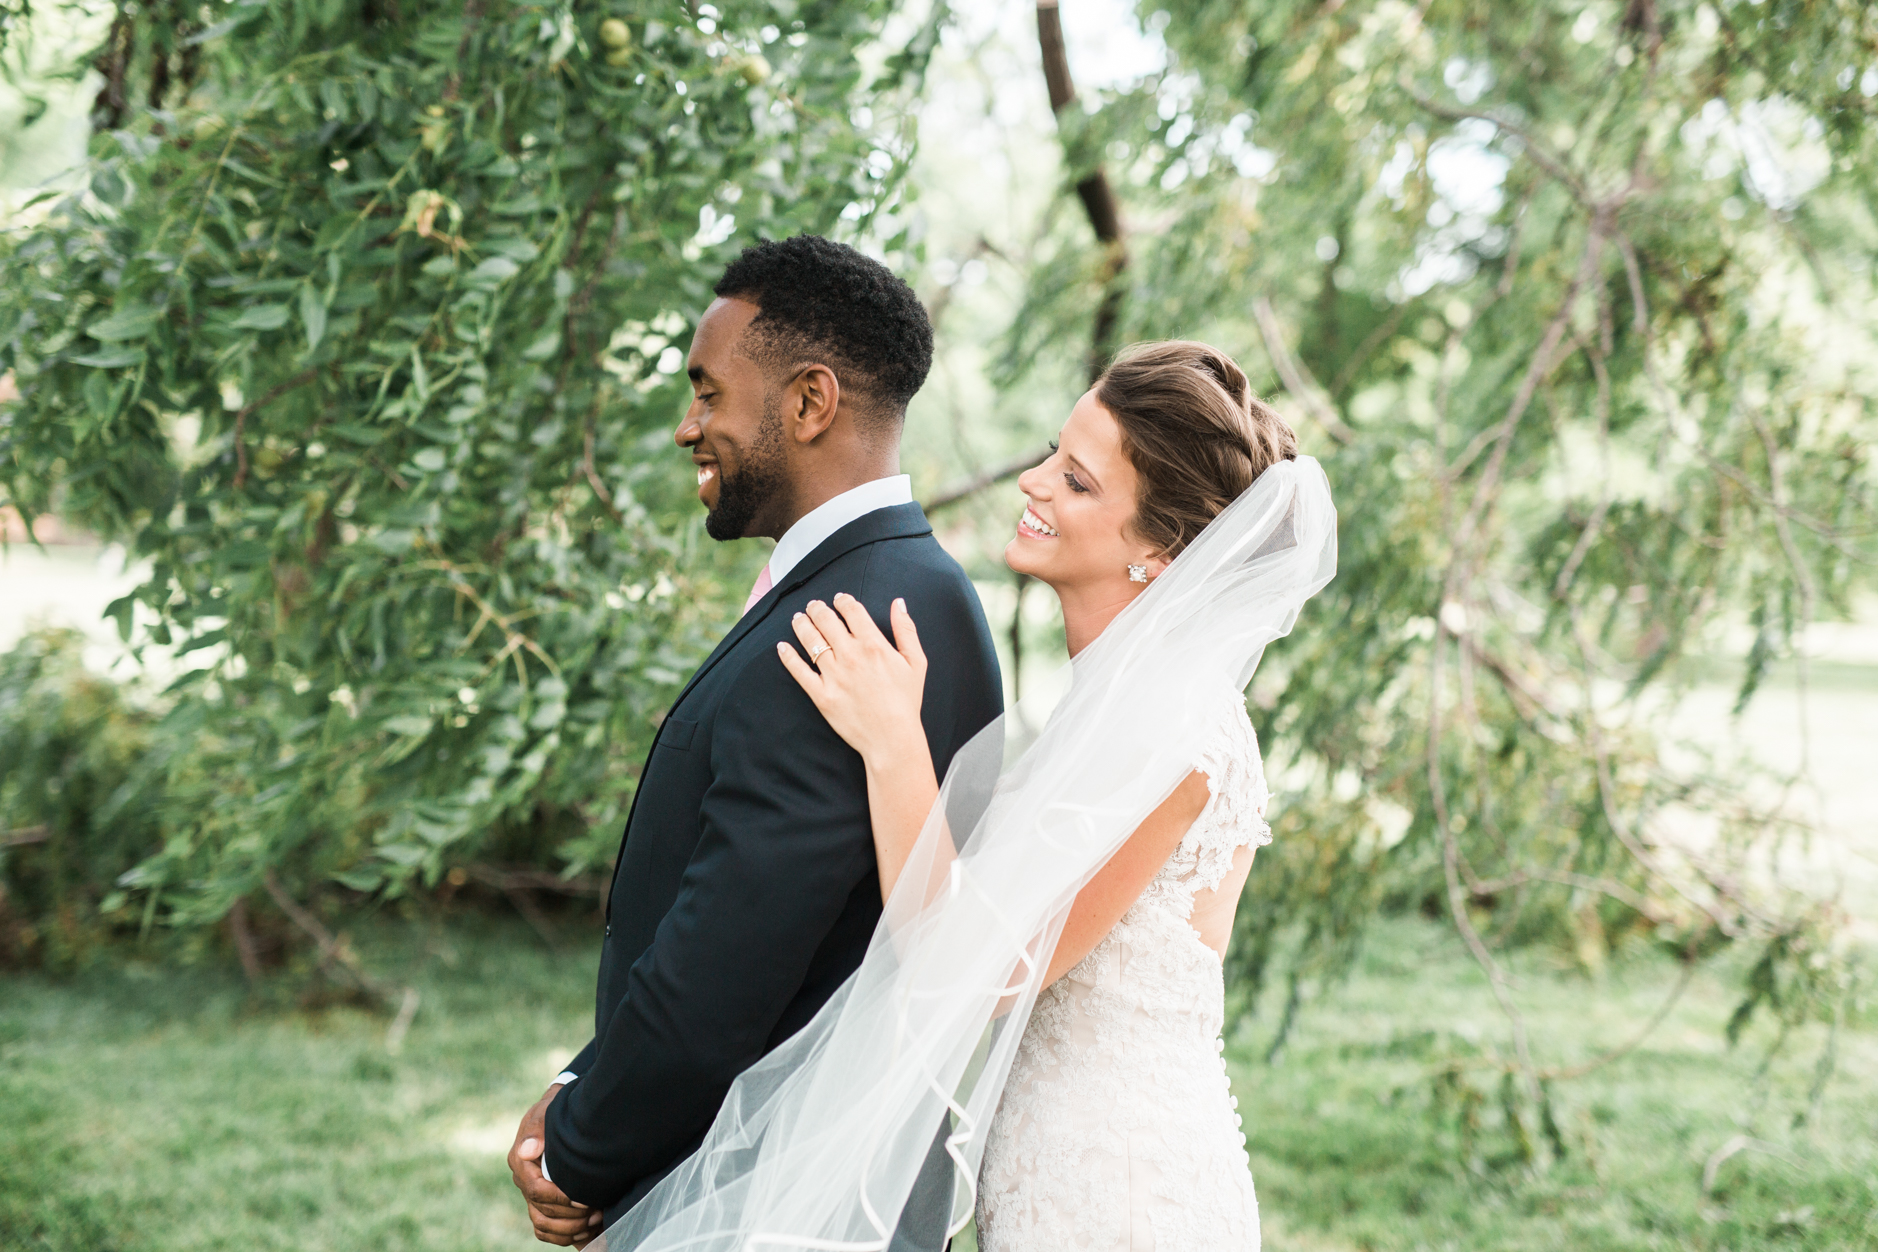 LegacyUnion-Wedding-Photographer-Glendale-CA-32.jpg